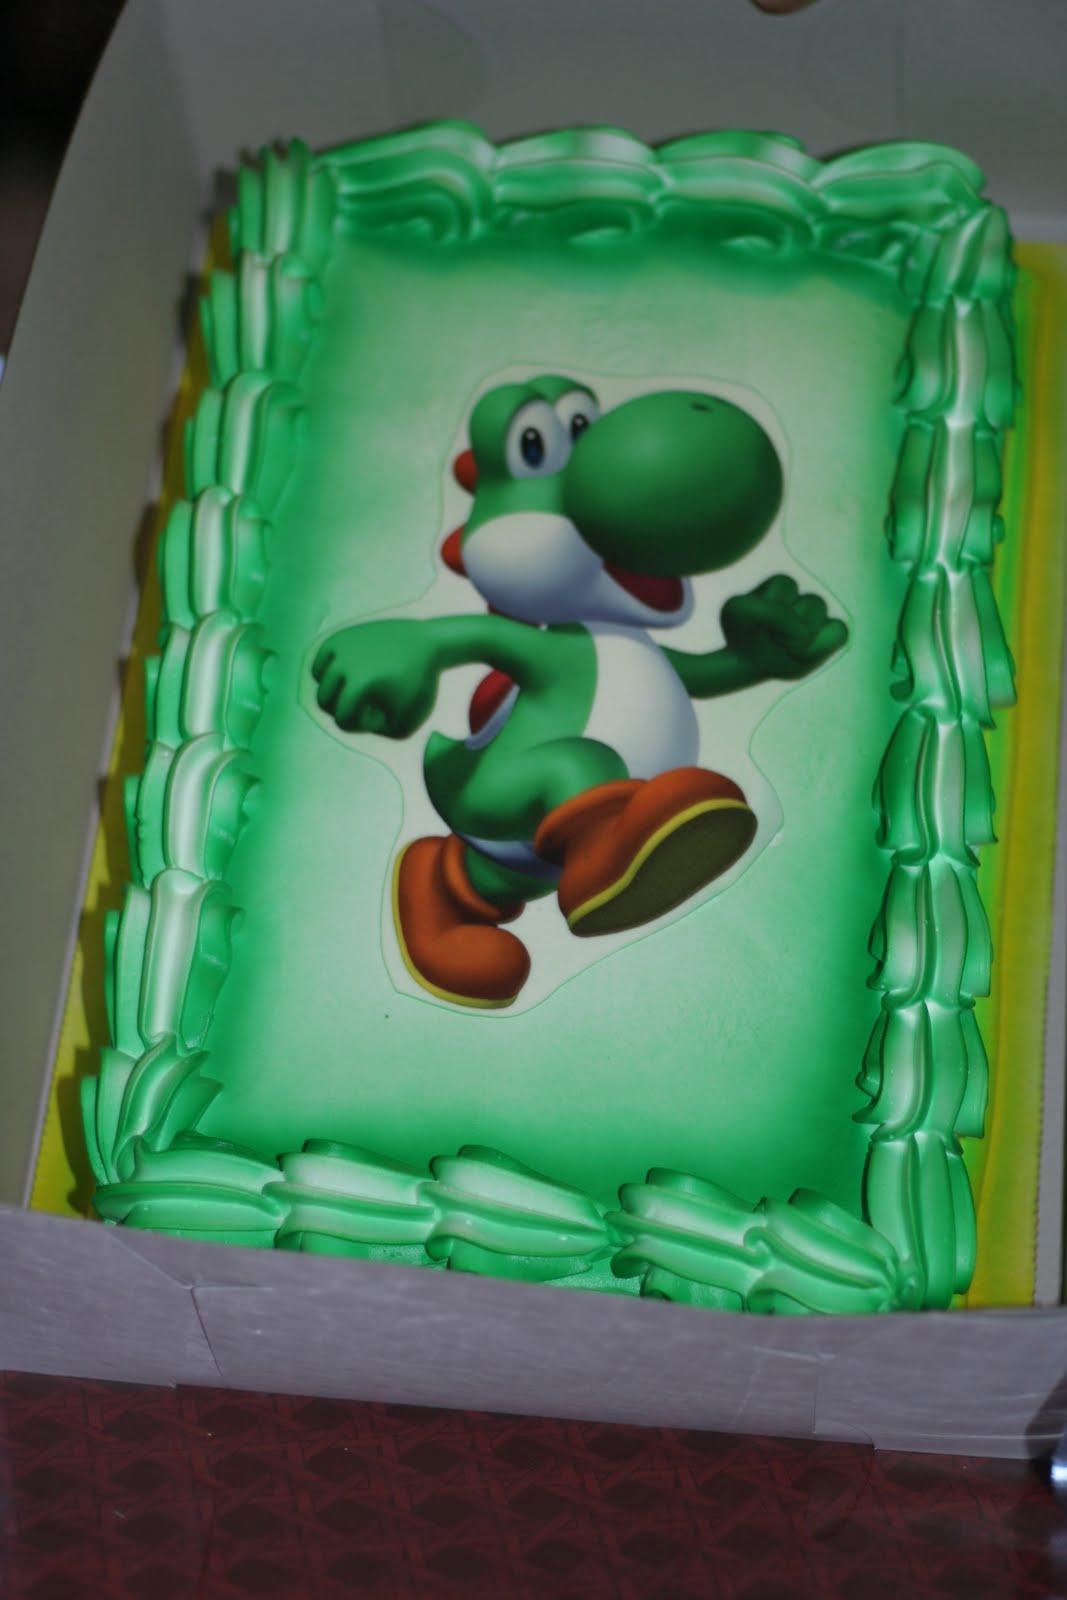 Custom Cake Images Edible : Hector s Custom Cakes: EDIBLE IMAGE CAKES